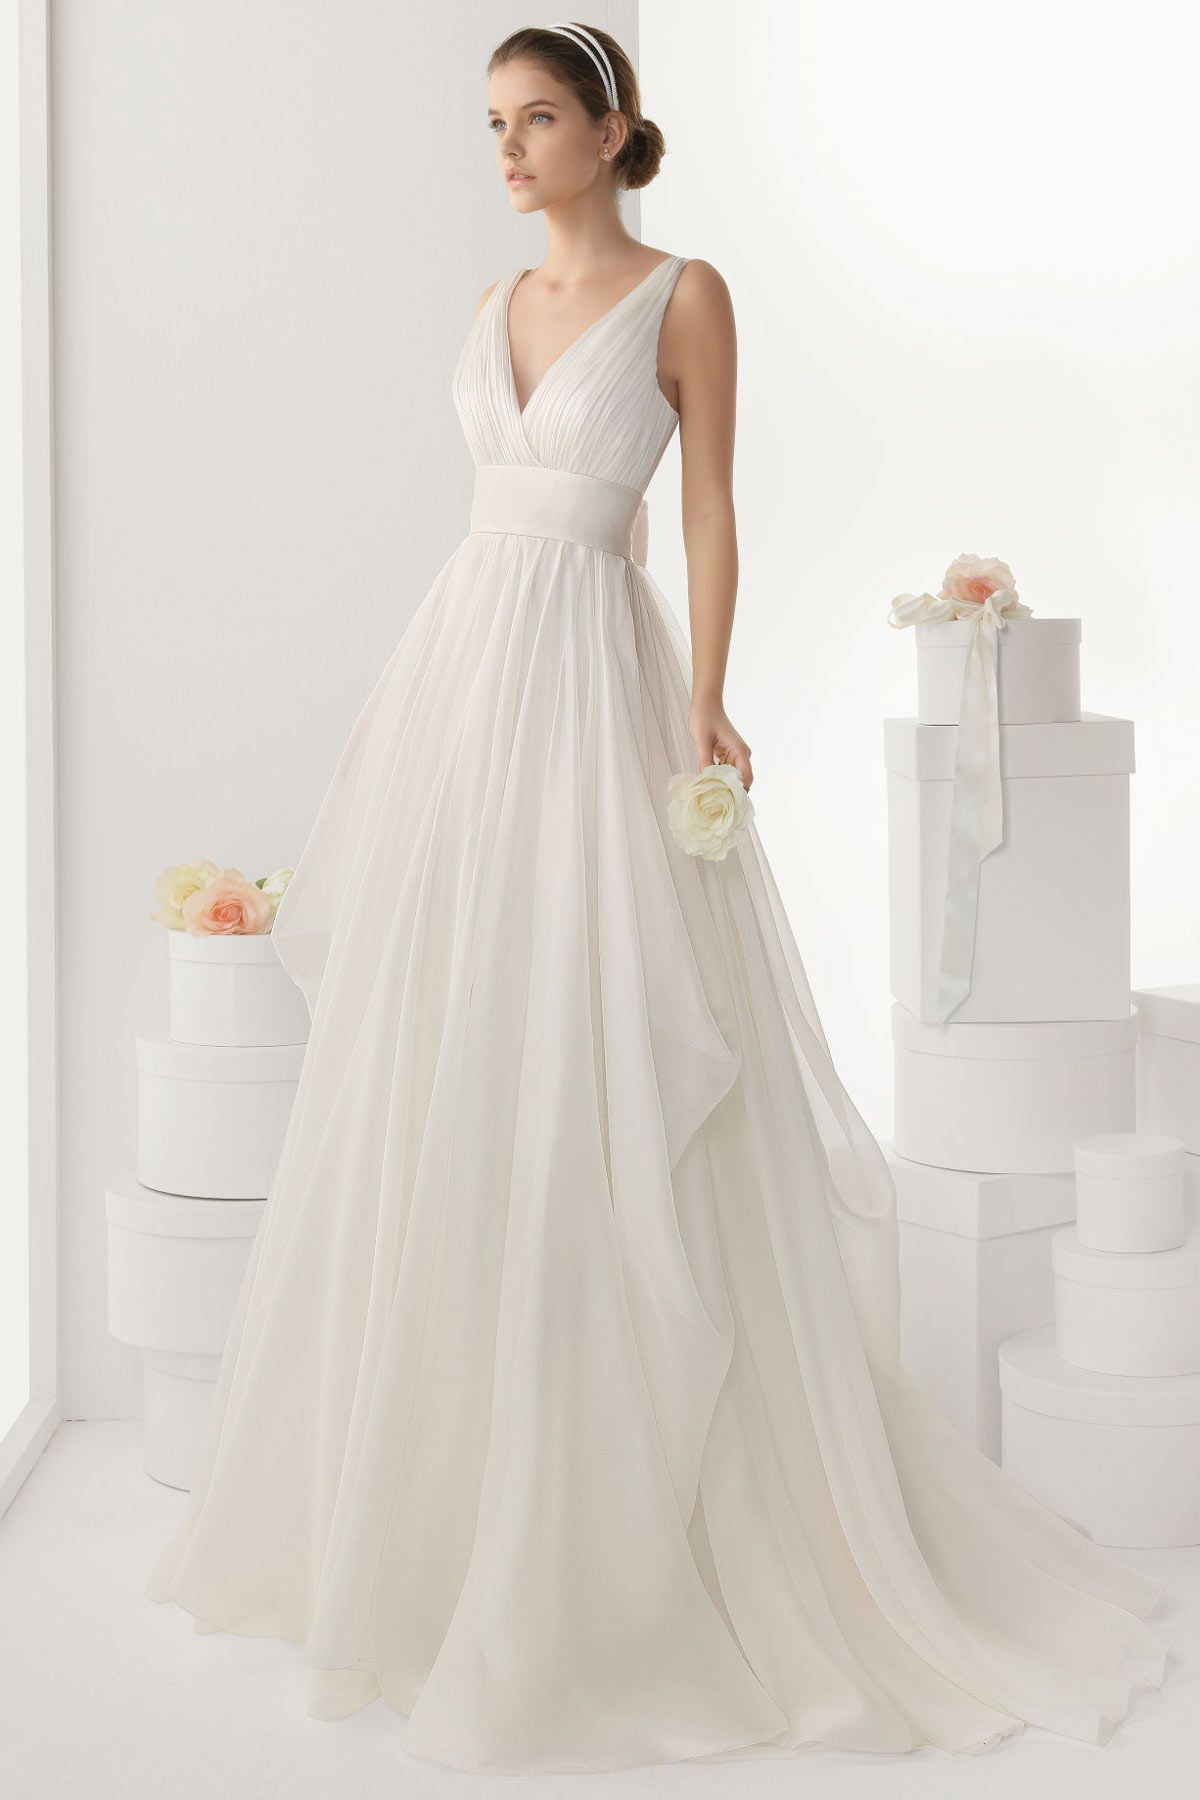 Simple and cheap wedding dresses  Sexy V neck Backless Bowknot Chiffon Wedding Dress Cheap WBDF